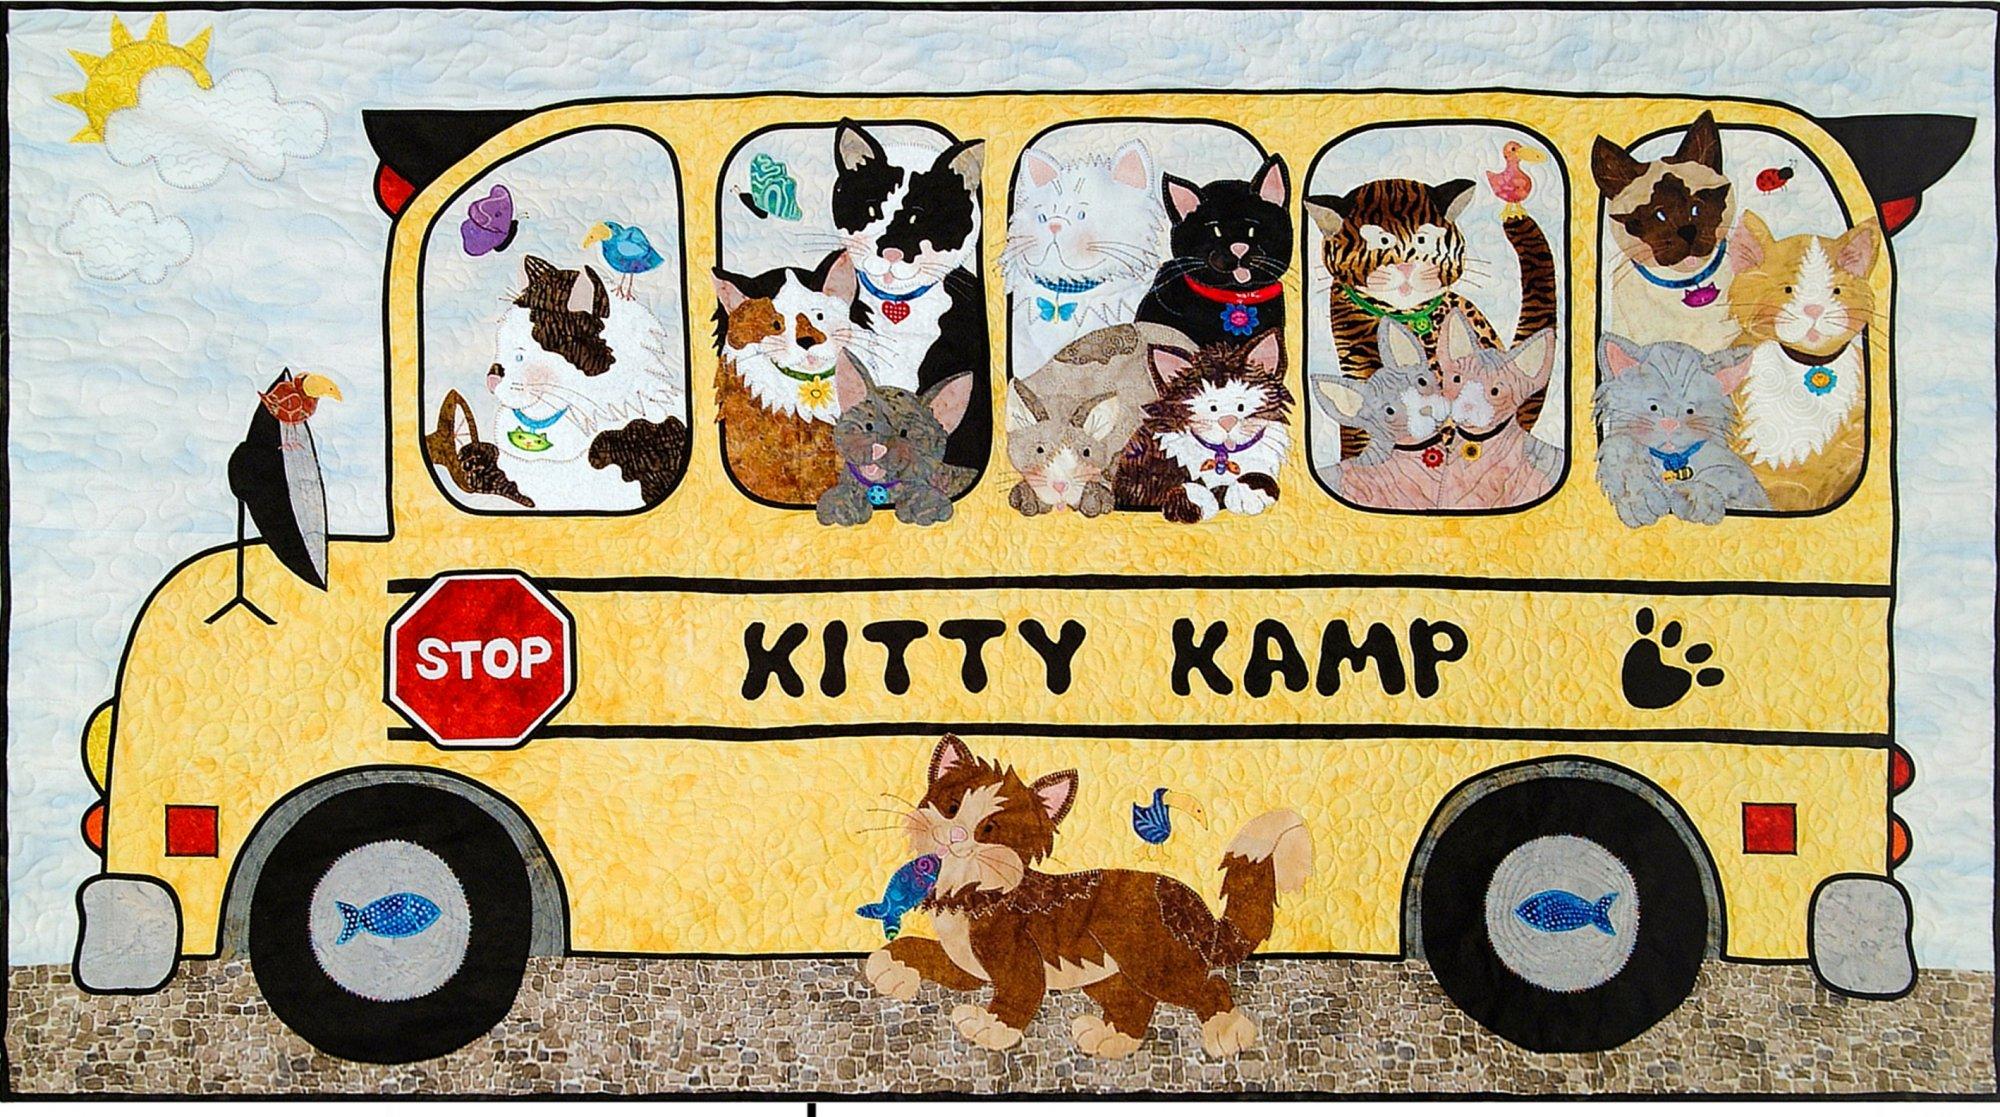 Kitty Kamp